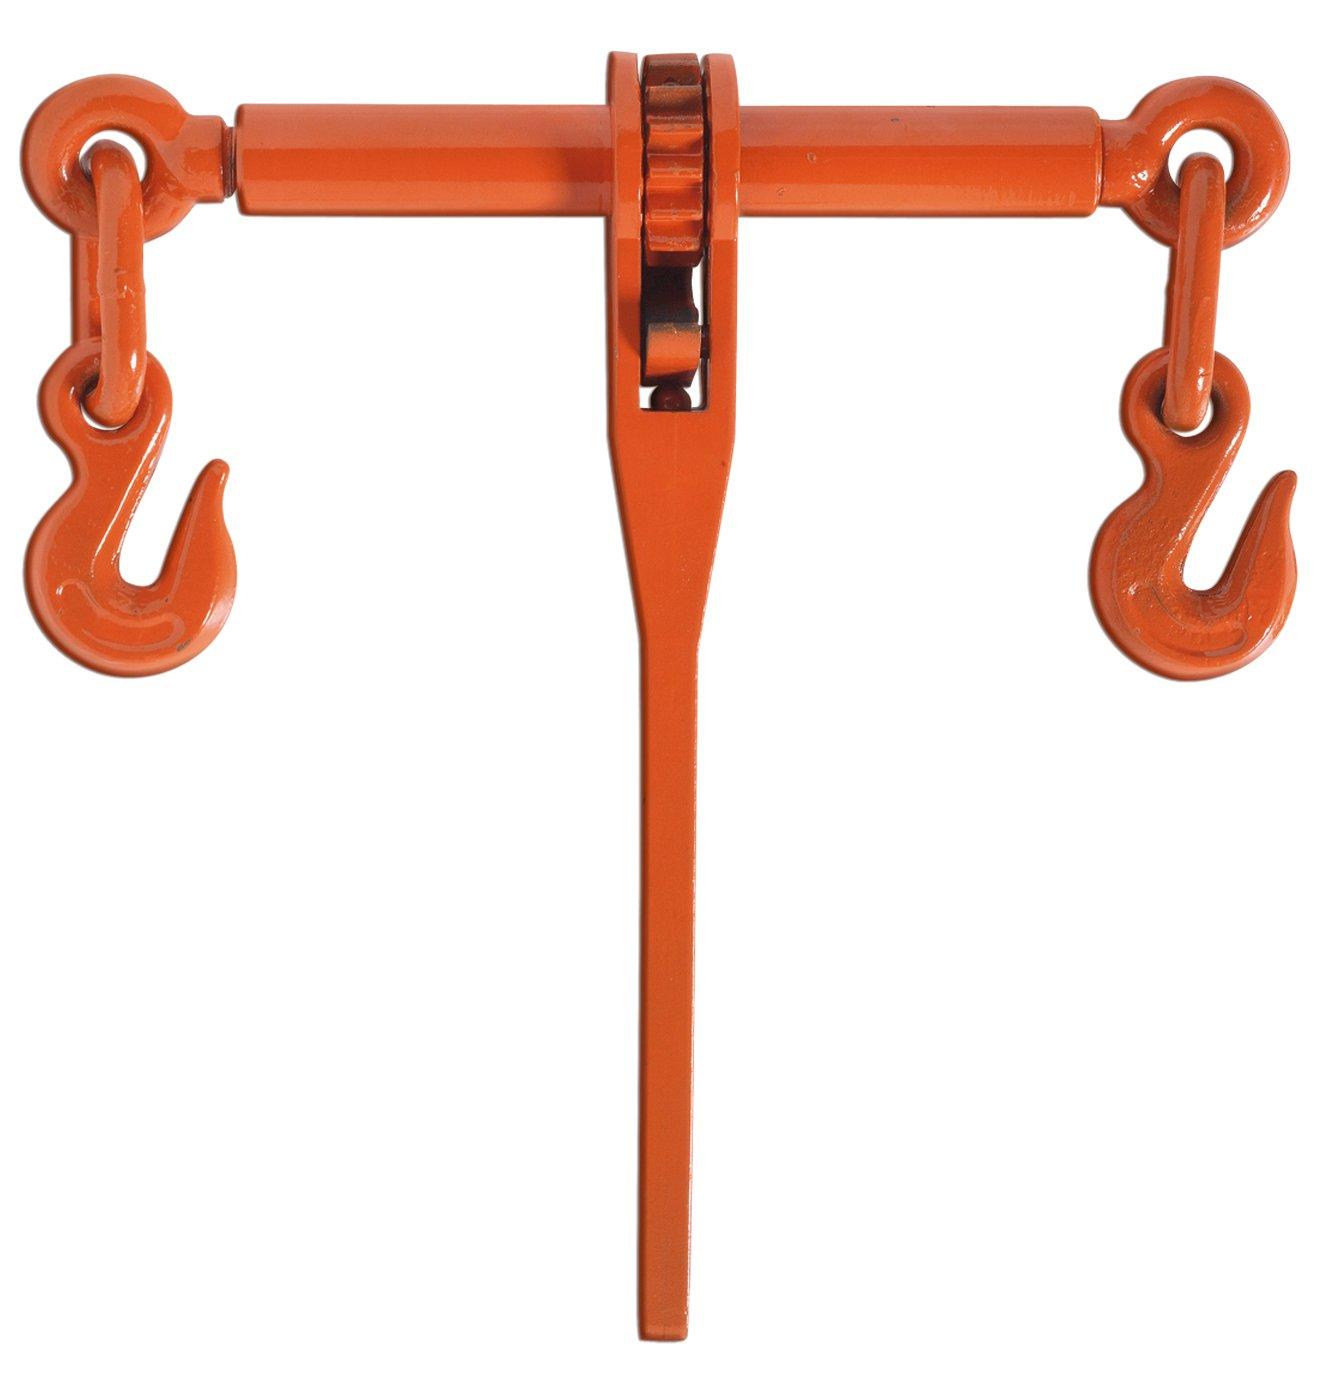 Koch 099312 3/8-Inch to 1/2-Inch Ratchet Load Binder